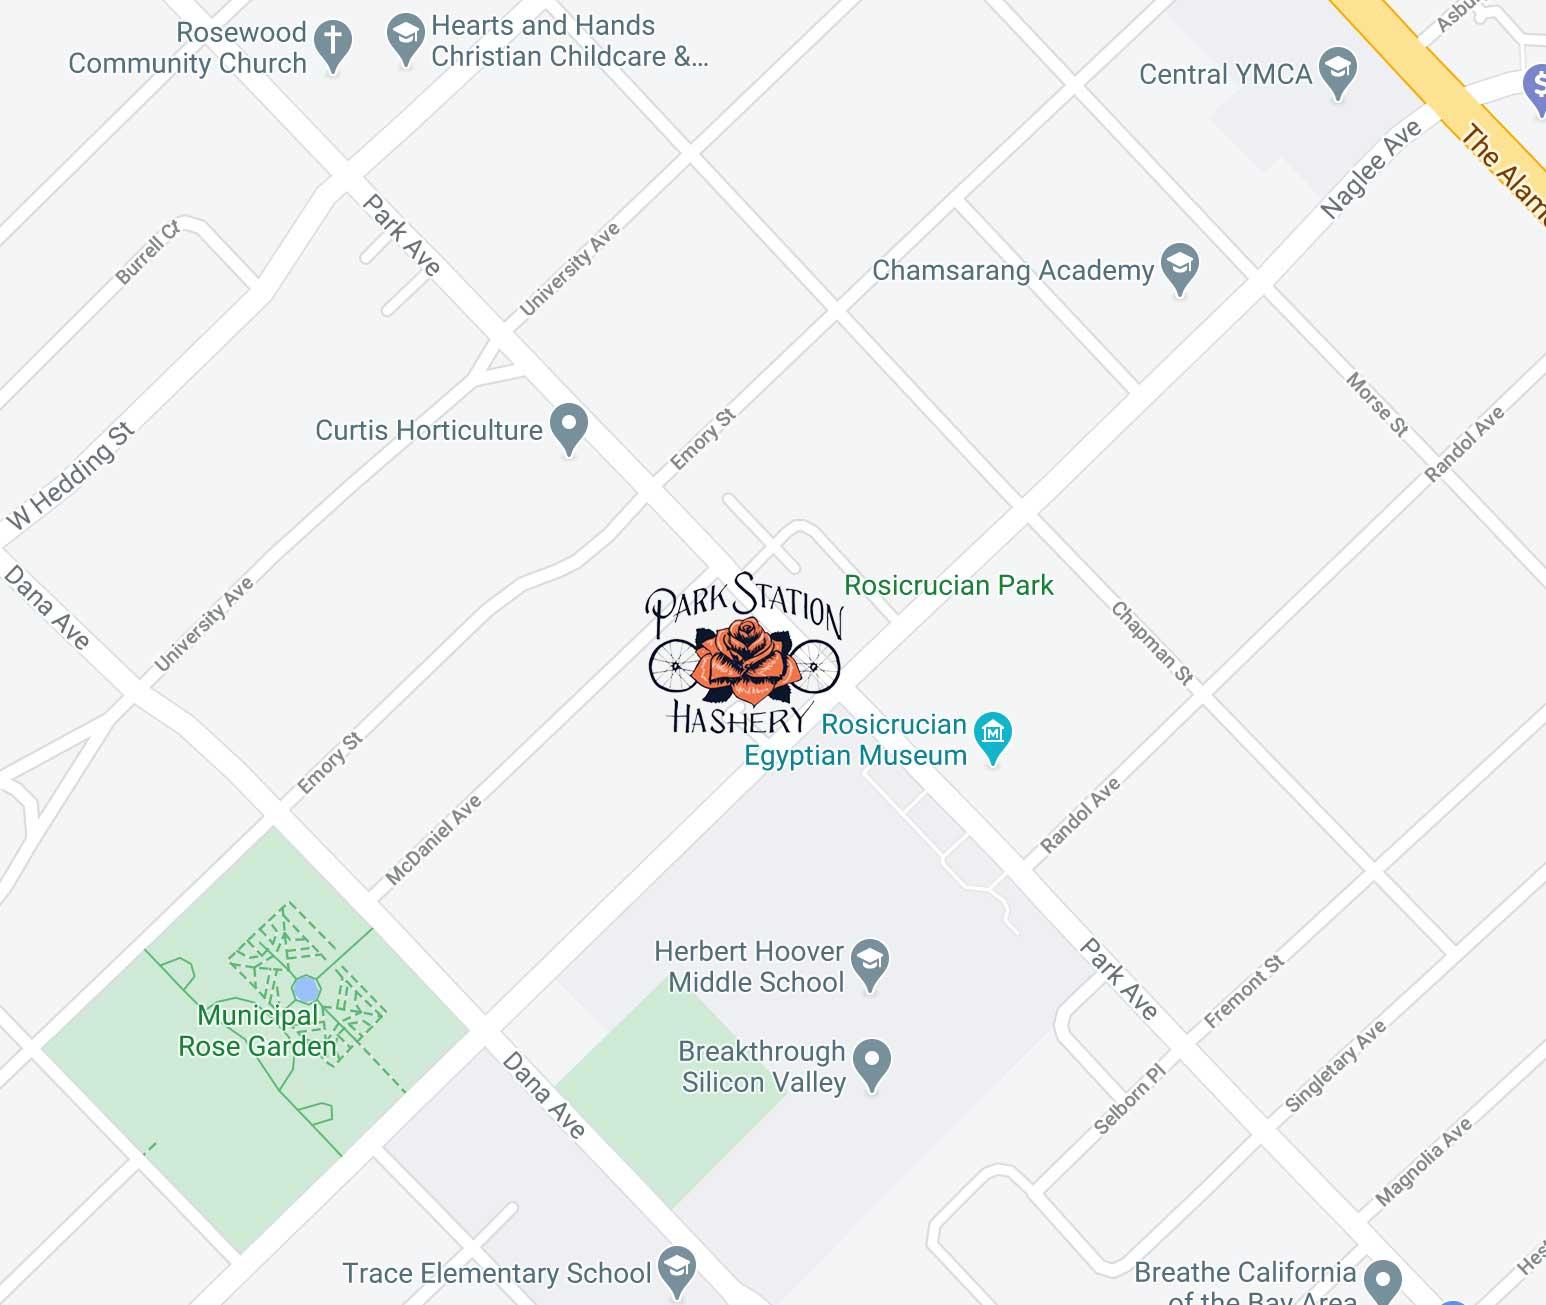 Park Station Hashery Location